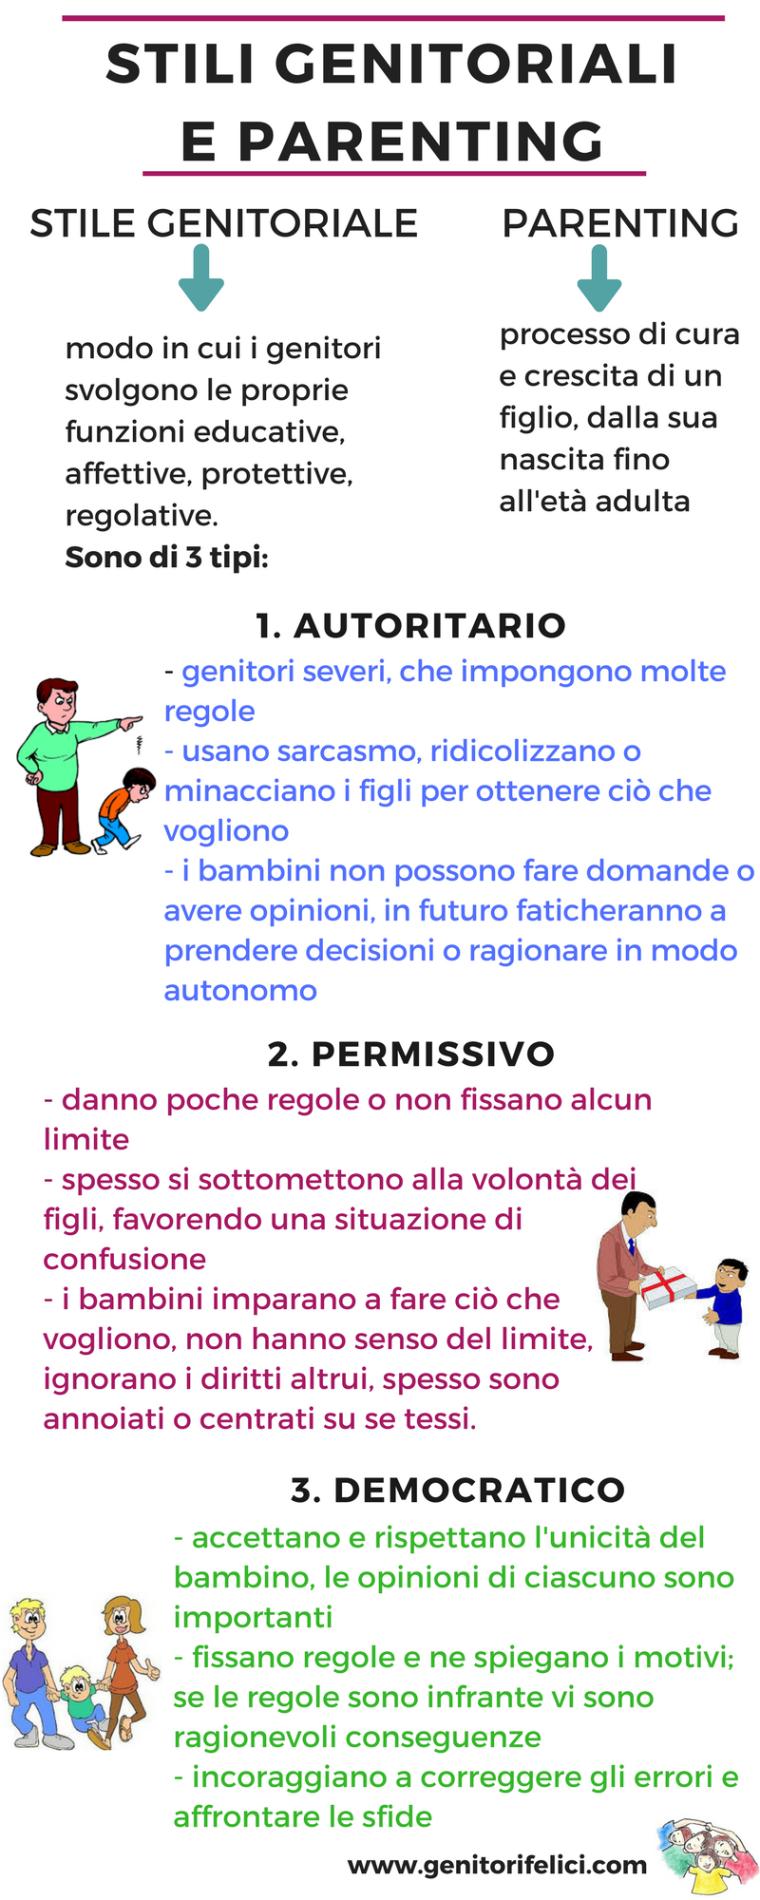 Stili genitoriali e parenting (infografica) -17 gen-